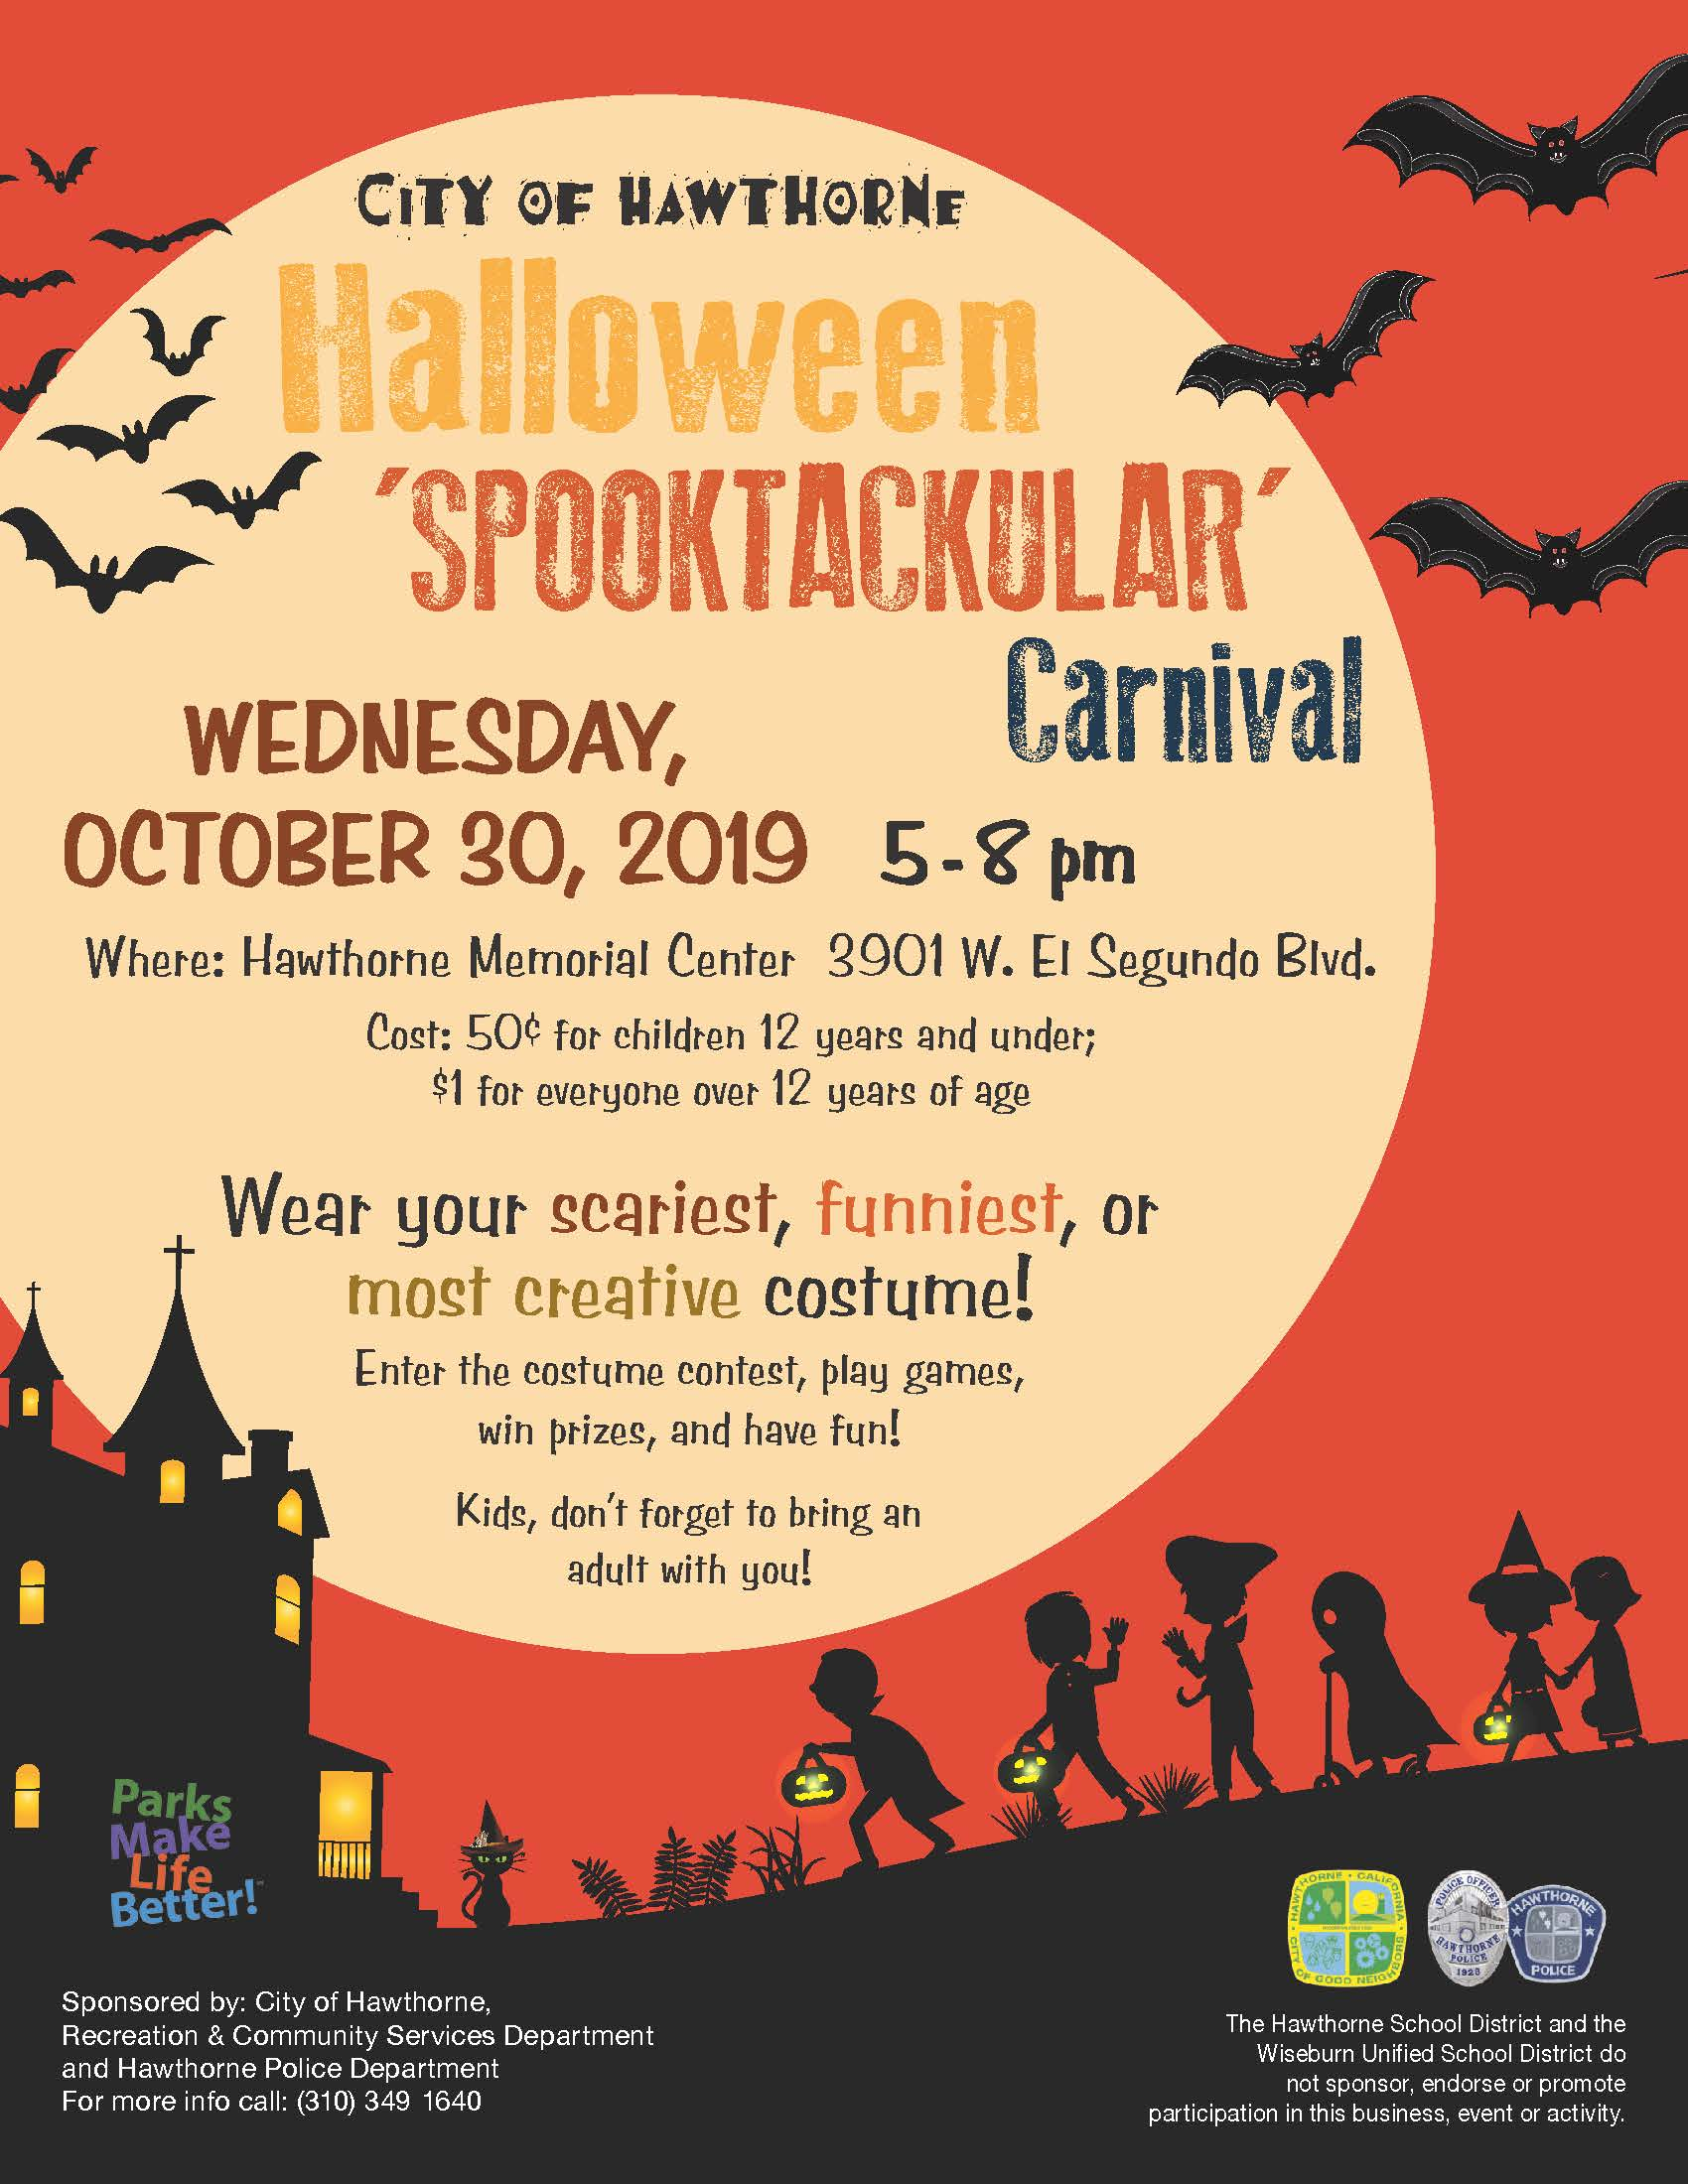 Halloween 'Spooktackular' Carnival